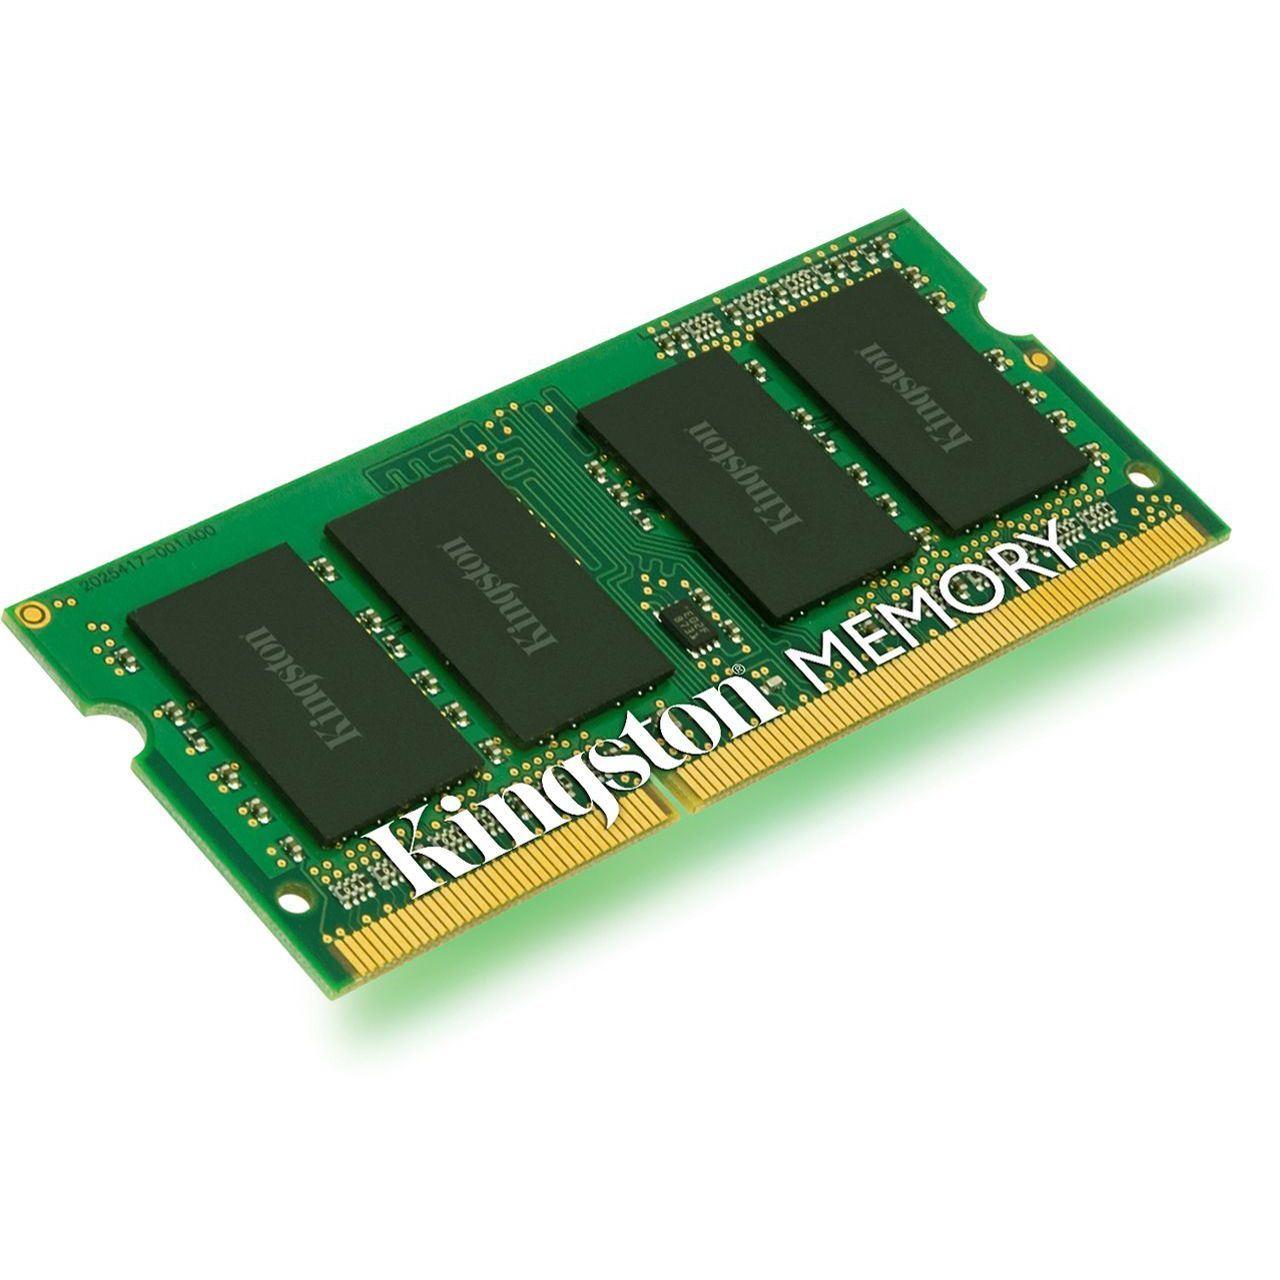 4GB Kingston ValueRAM DDR3-1600 SO-DIMM CL11 Single ) (2x2GB) für 14,10€ @Mindstar (incl. Versand und Paypal)